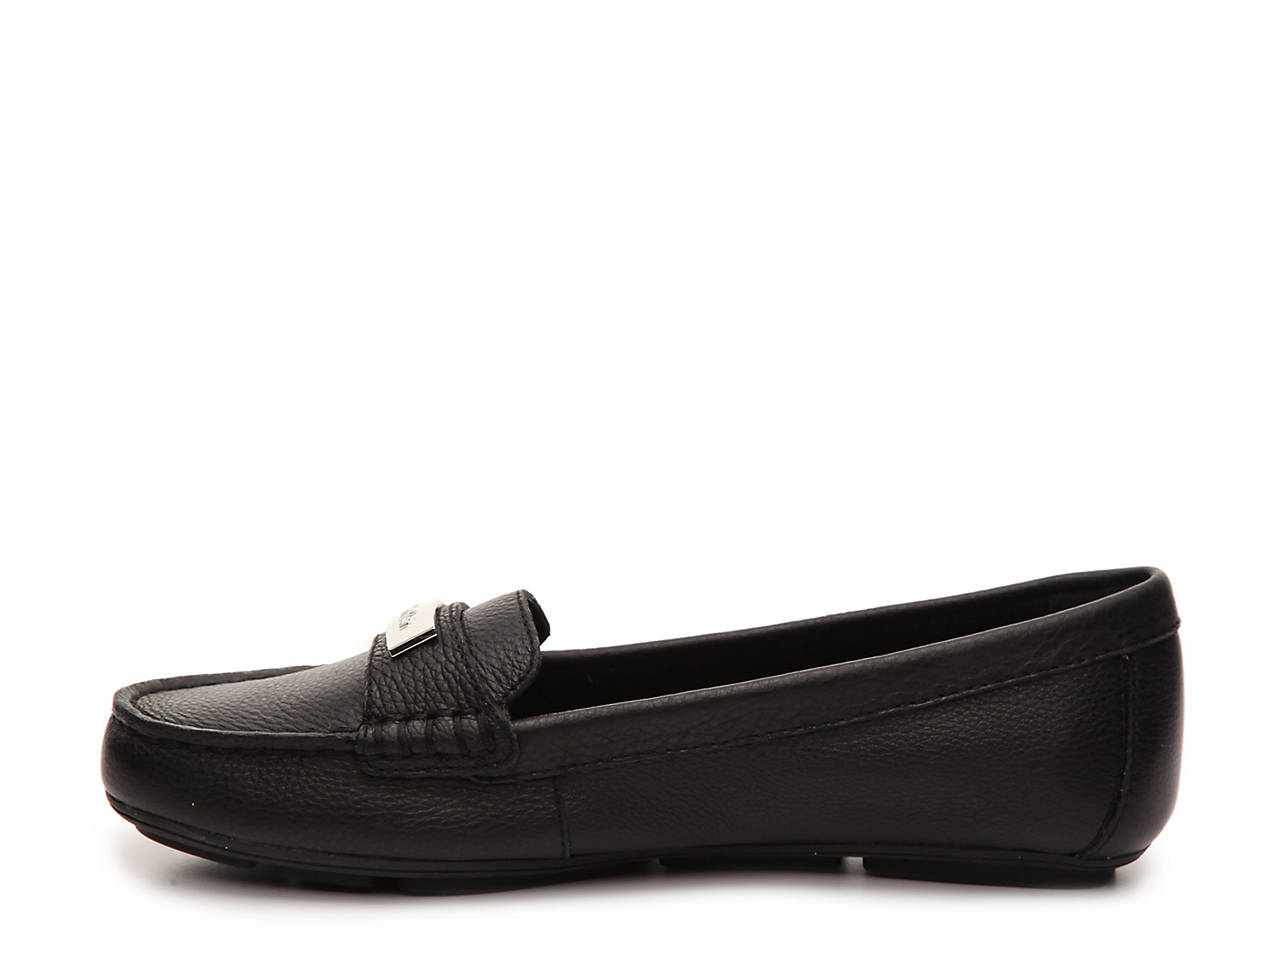 b659a2a1899 Calvin Klein Lavida Loafer Women s Shoes